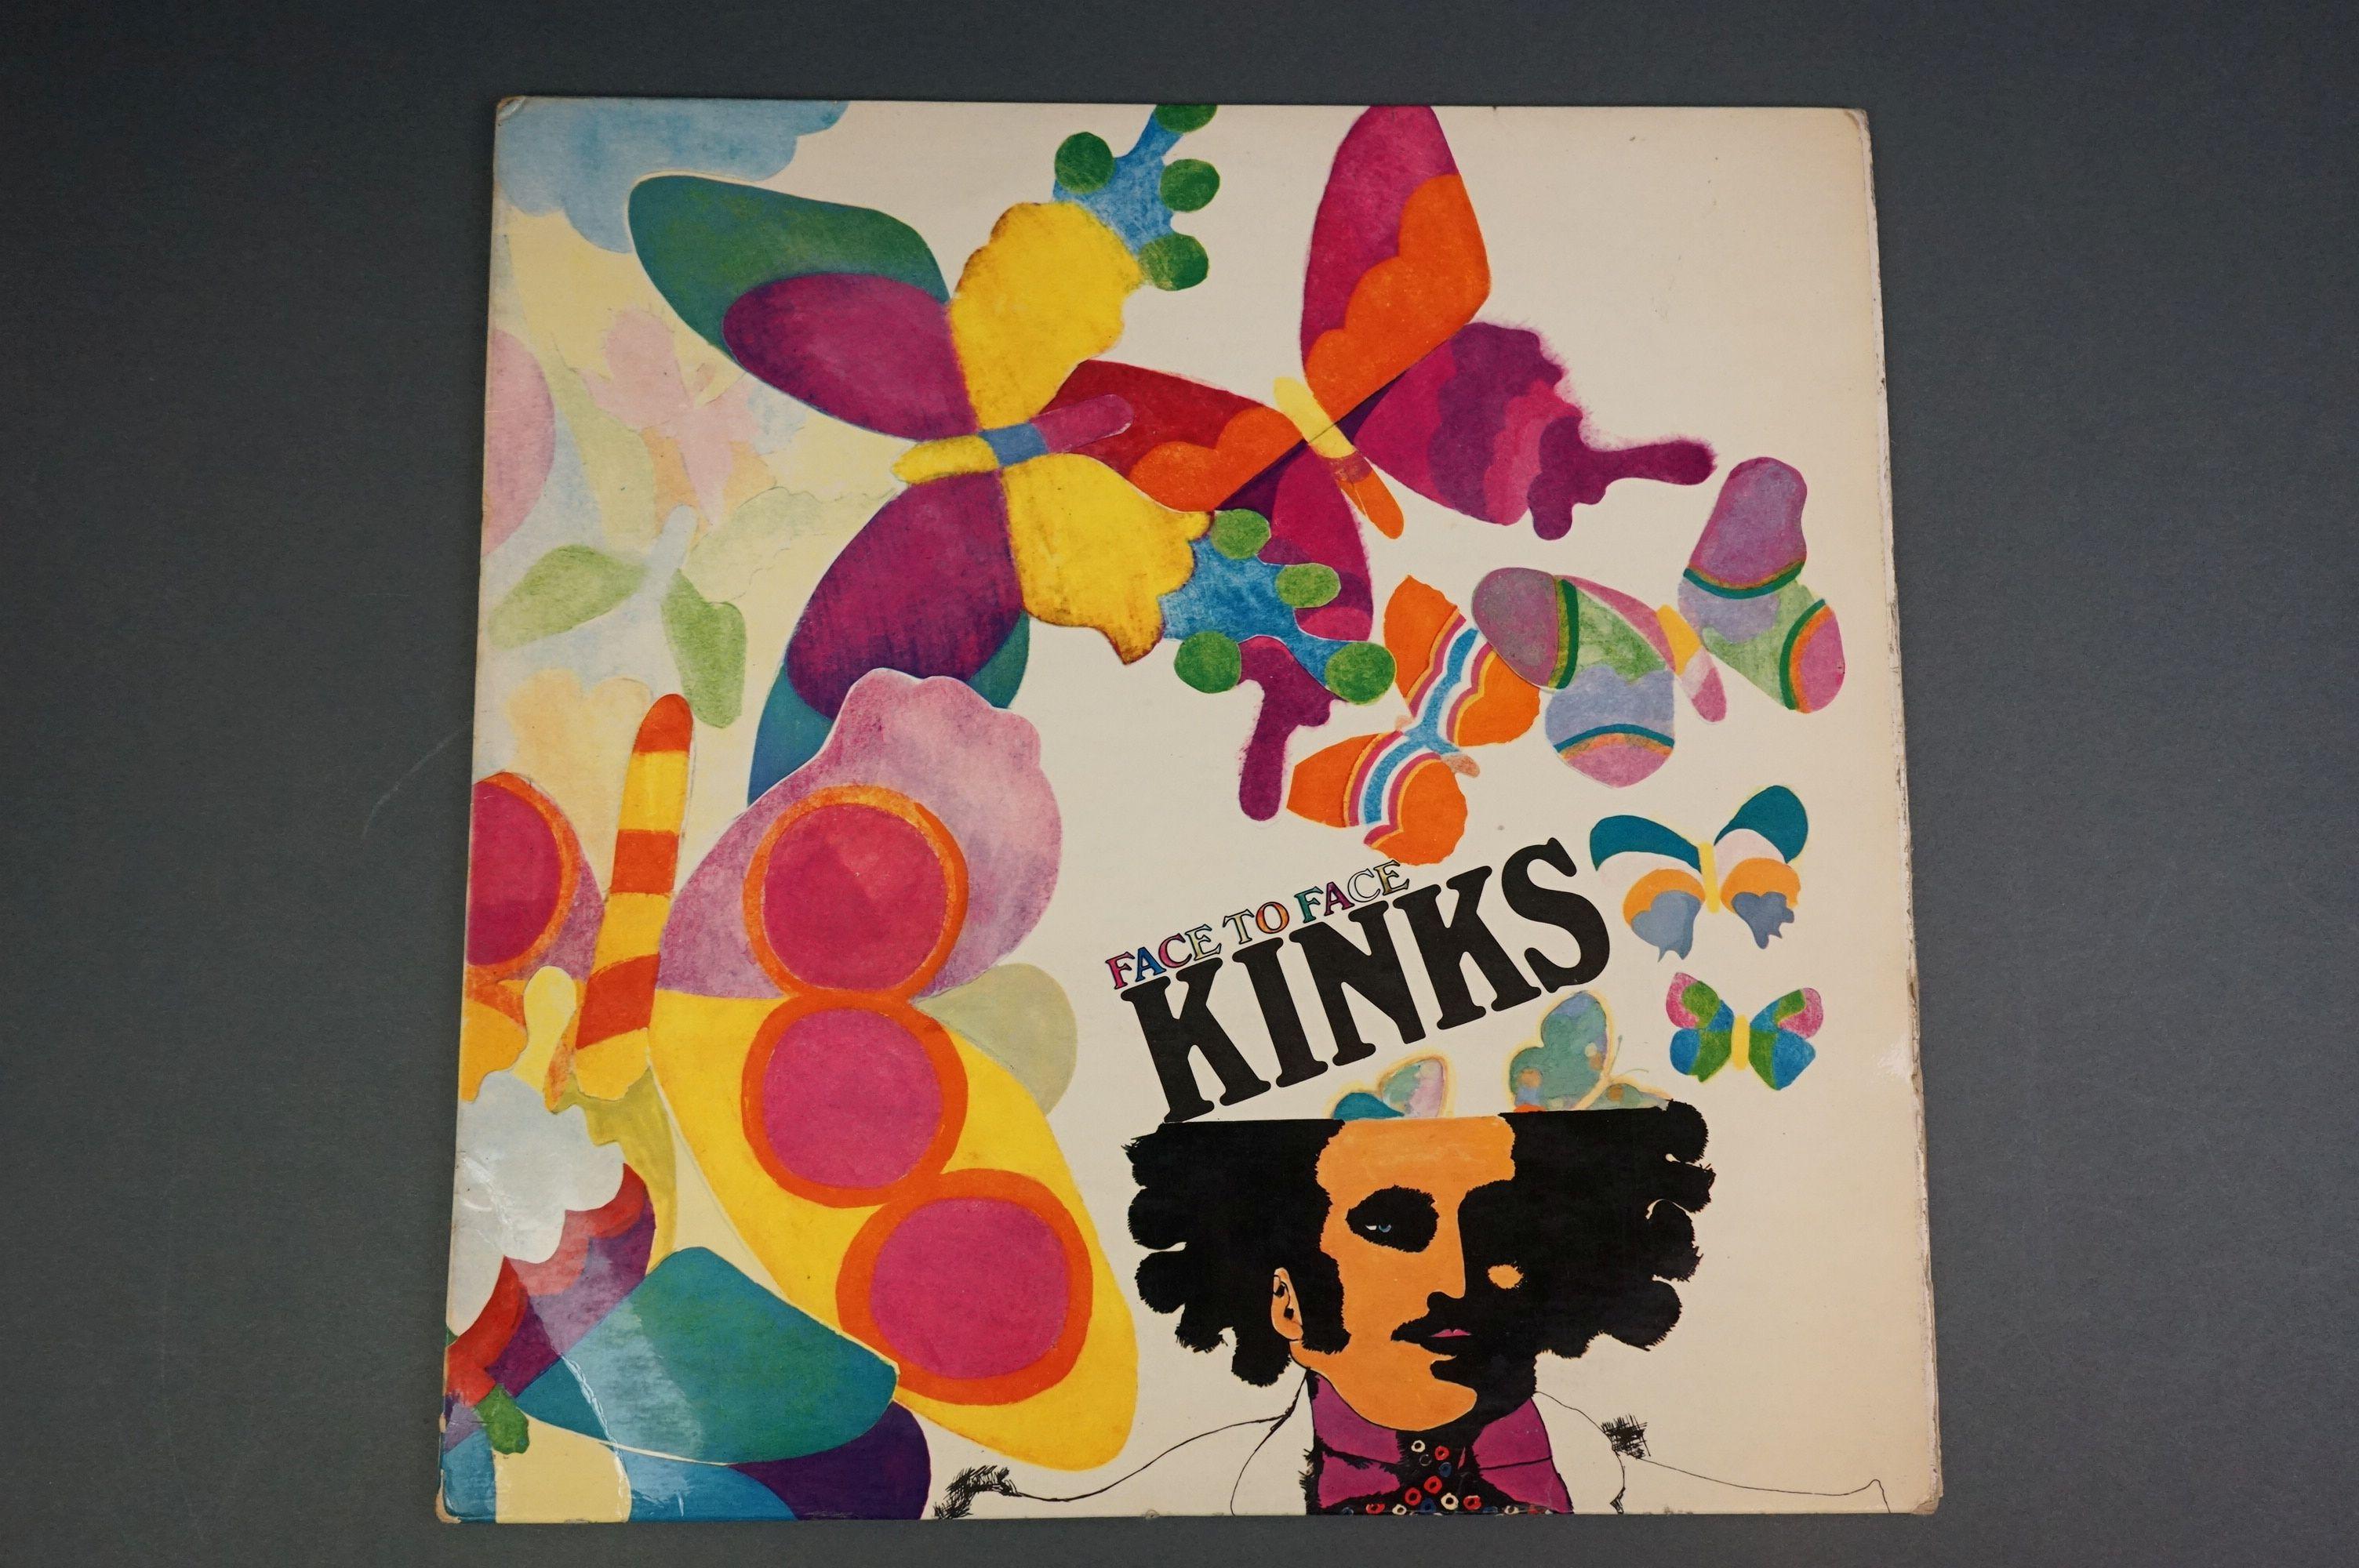 Vinyl - Kinks Face To Face NPL18149 Pye label, flip back, sleeve & vinyl vg+